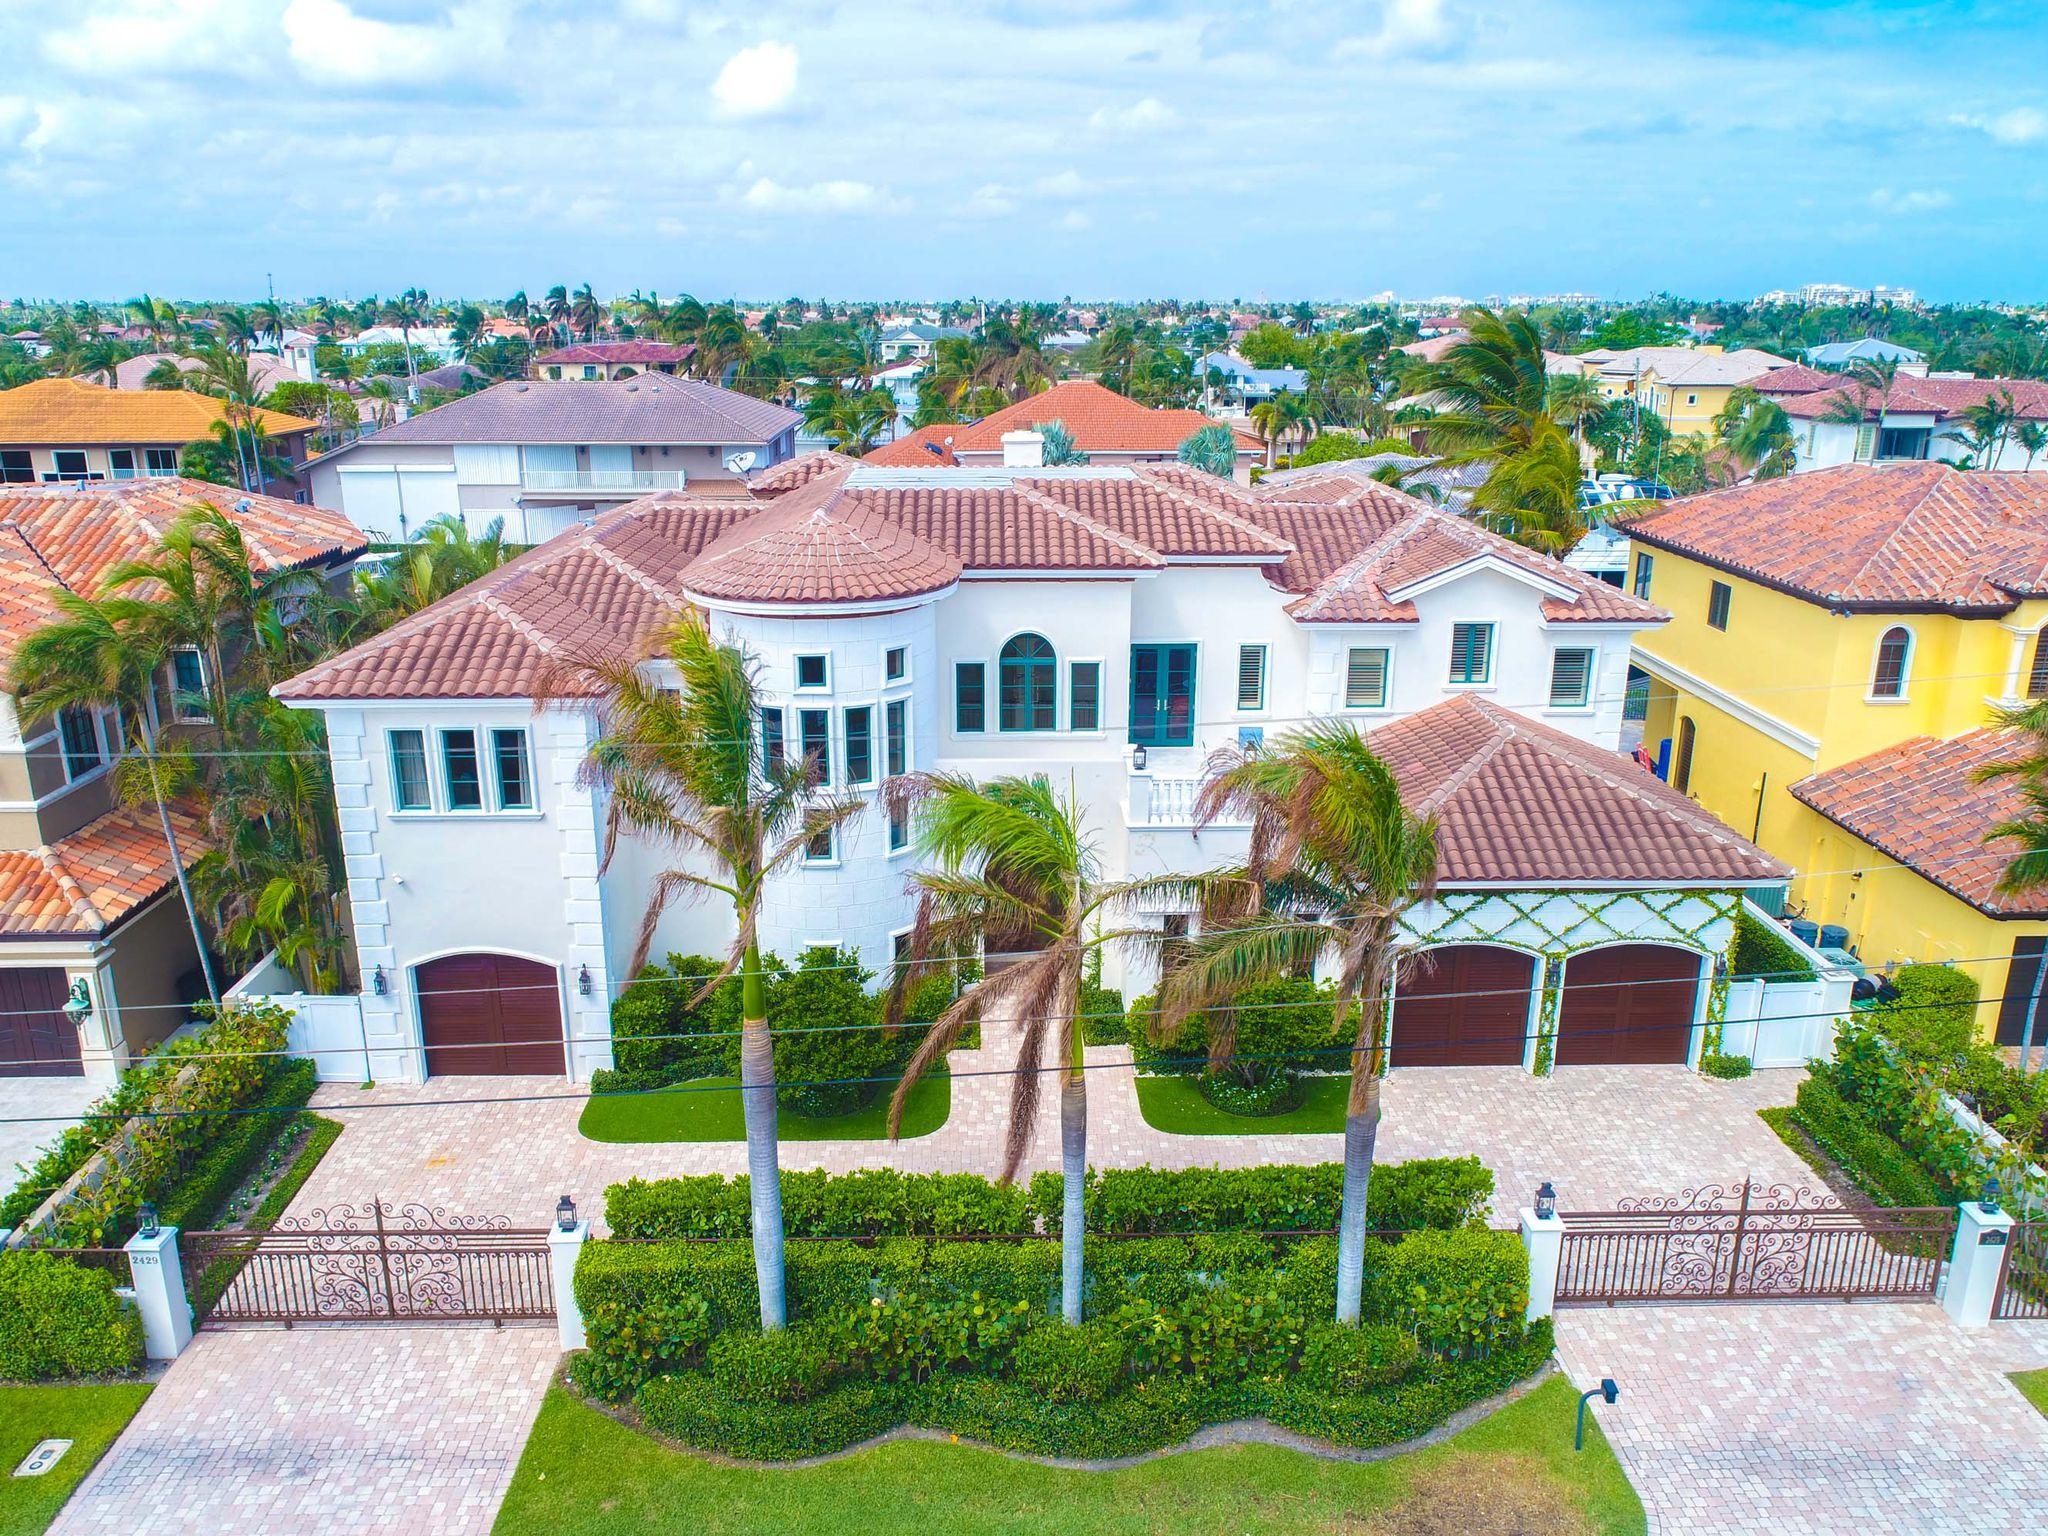 2429 NE 25th St For Sale - Lighthouse Pt, FL | Trulia